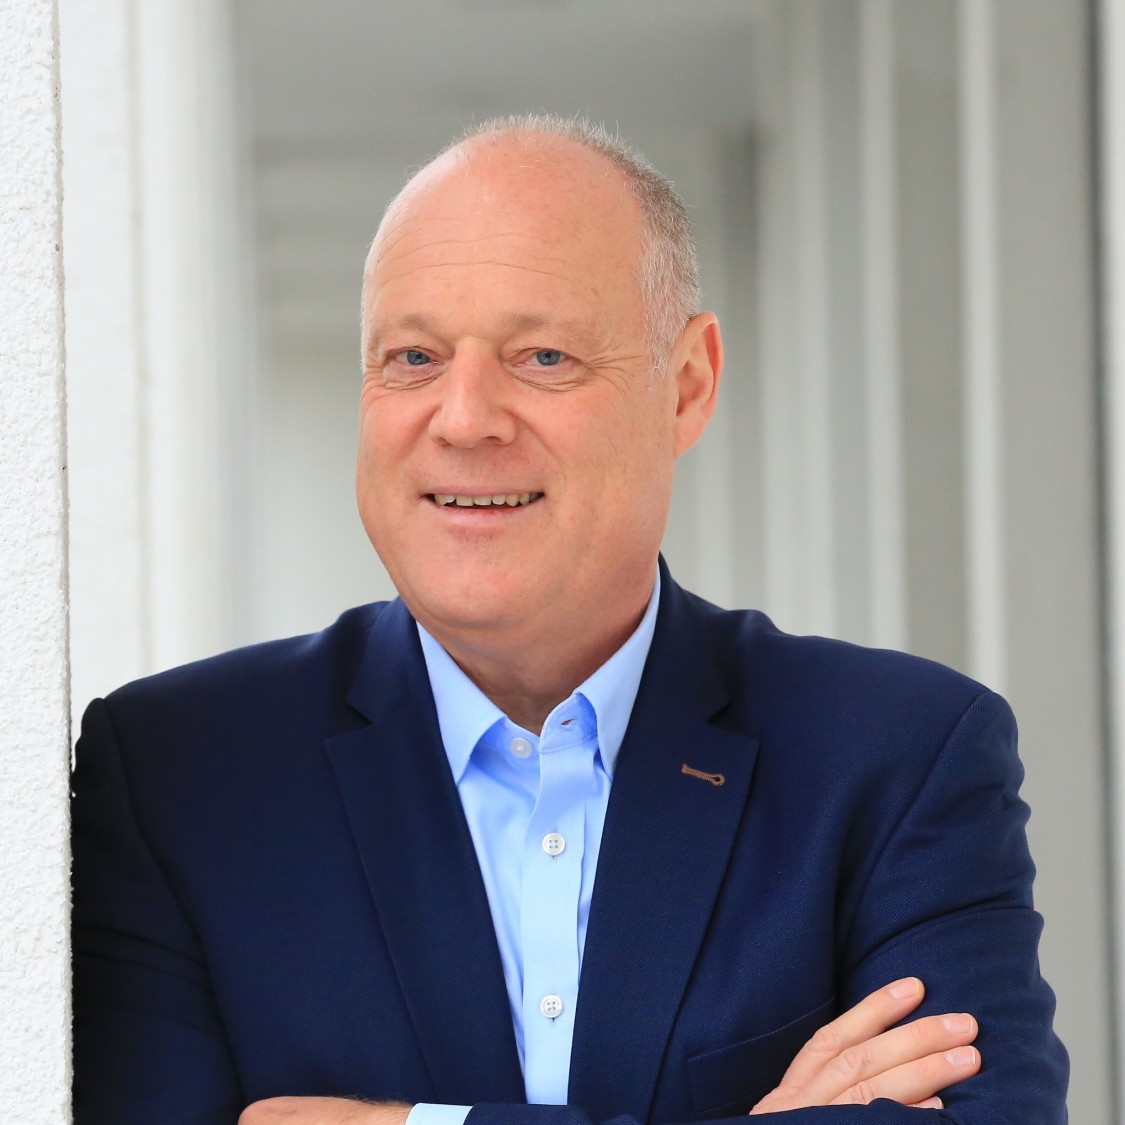 Eckard Eberle, CEO Process Automation